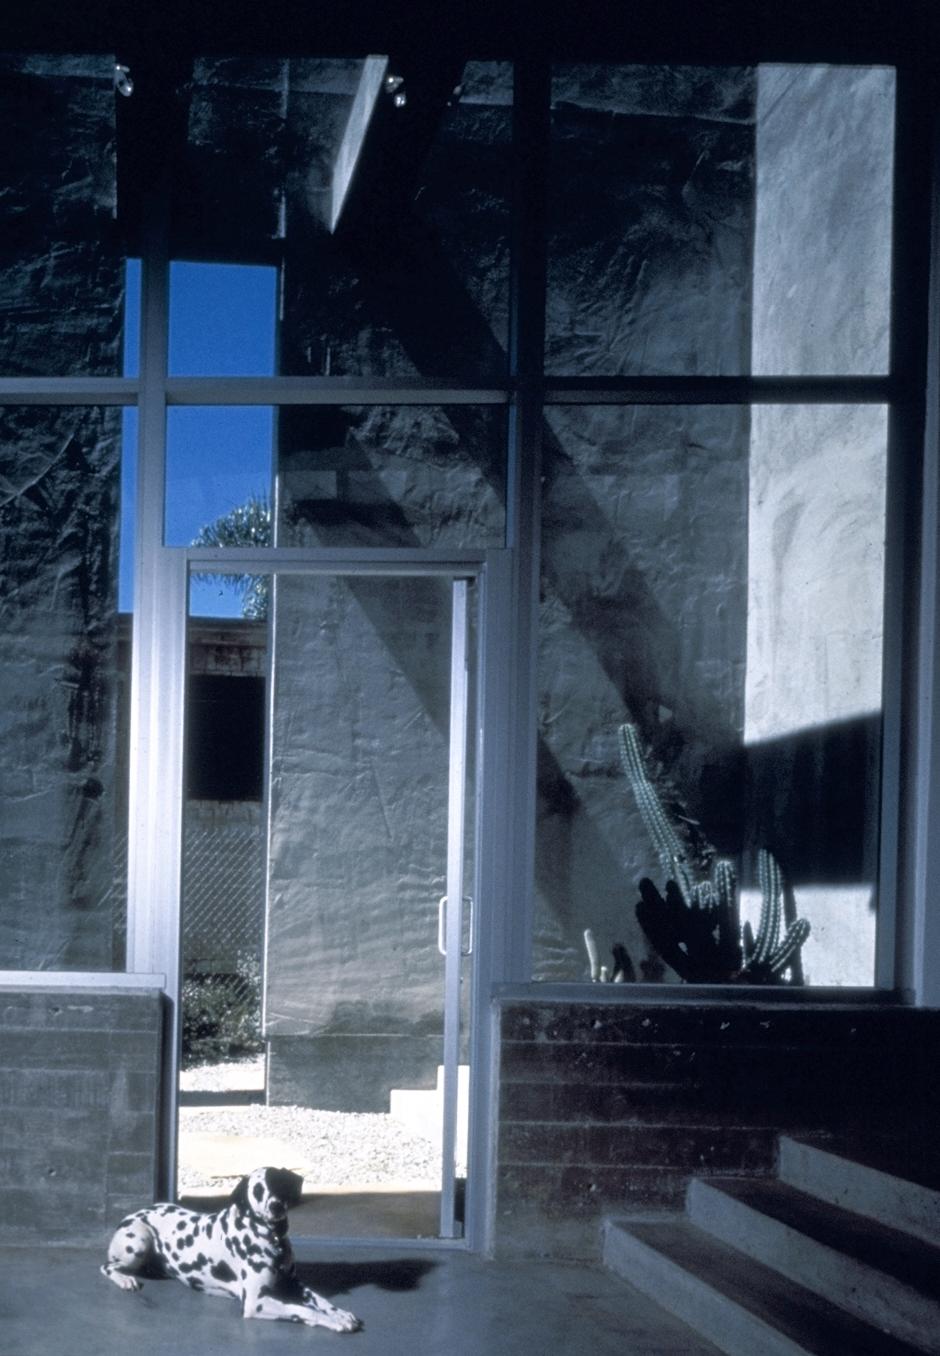 S.E.A.-Studio-Environmental-Architecture-David-Hertz-FAIA-Venable-House-Venice-Beach-sustainable-regenerative-restorative-design-residential-contemporary-modern-passive-systems-recycled-wood-concrete-green-building-canal-beachhouse-studioea-12.jpg